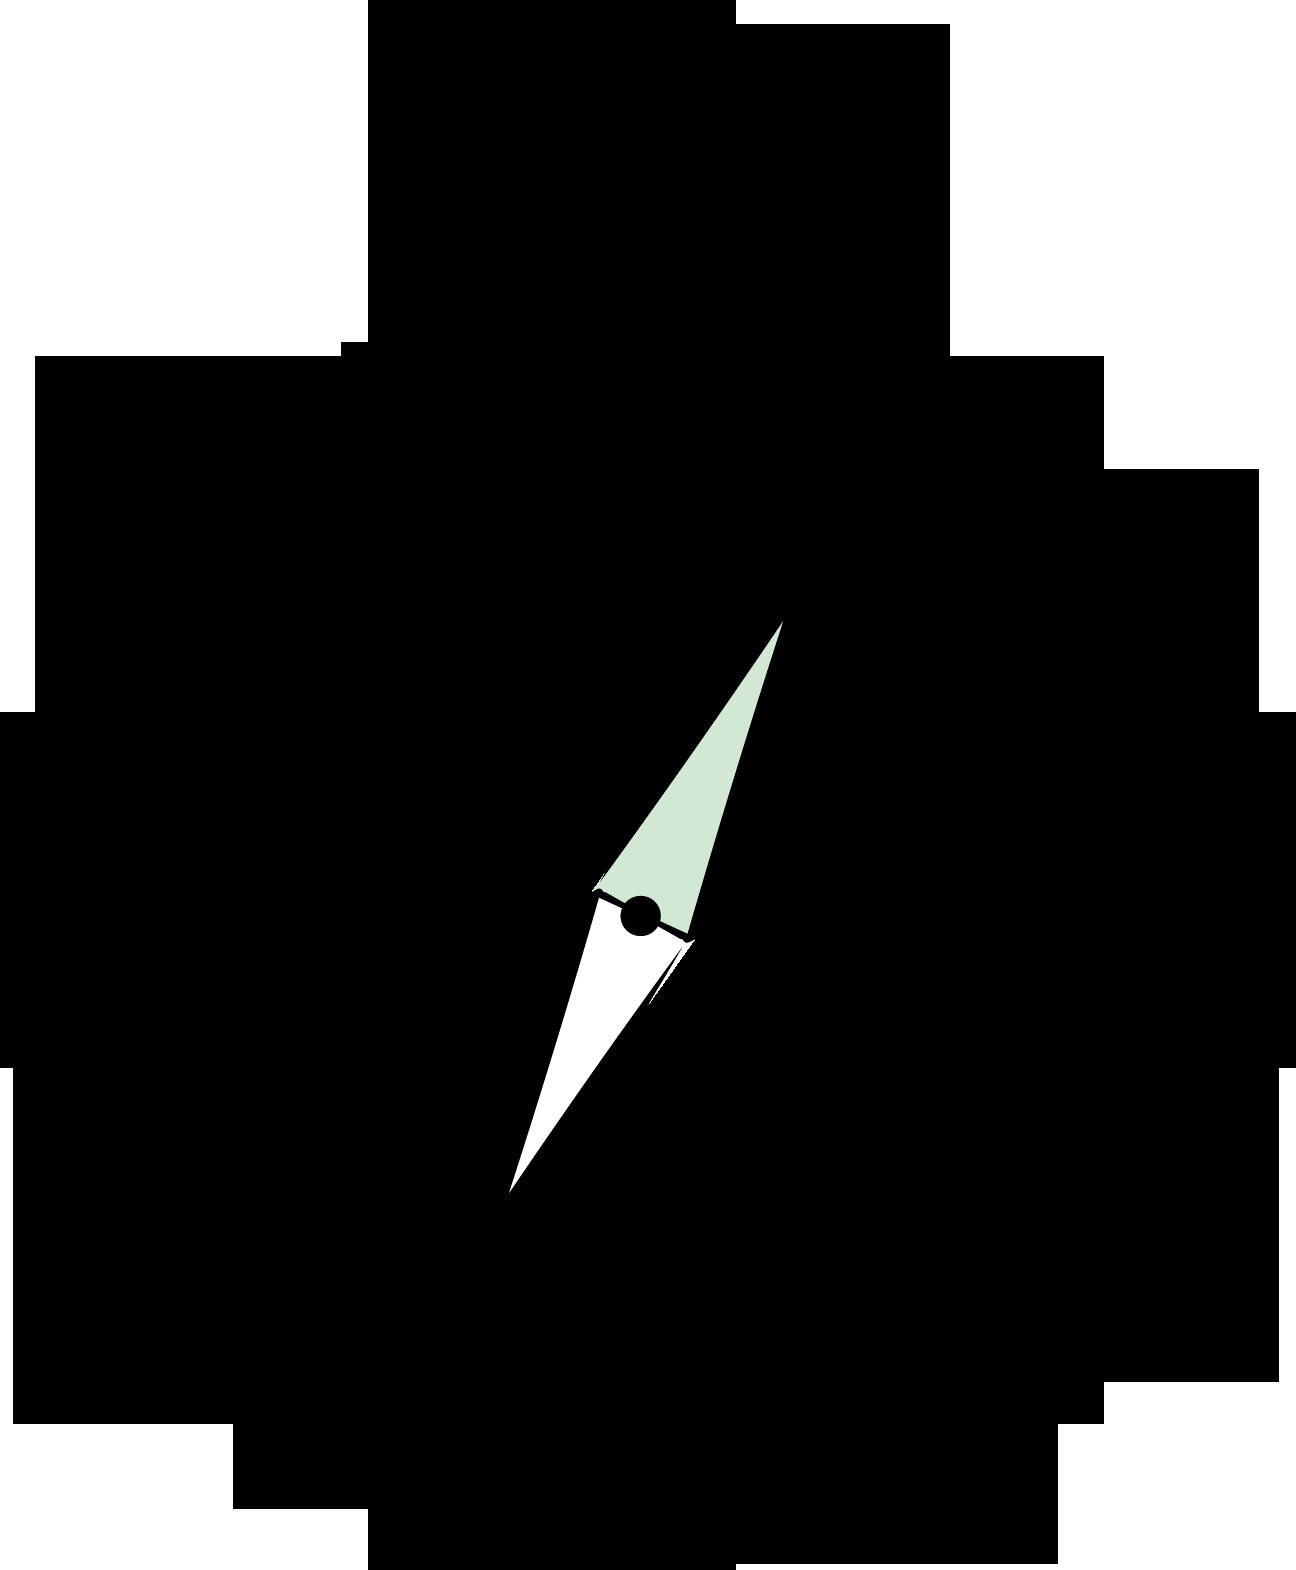 Ham clipart drawn. Compass drawing clip art